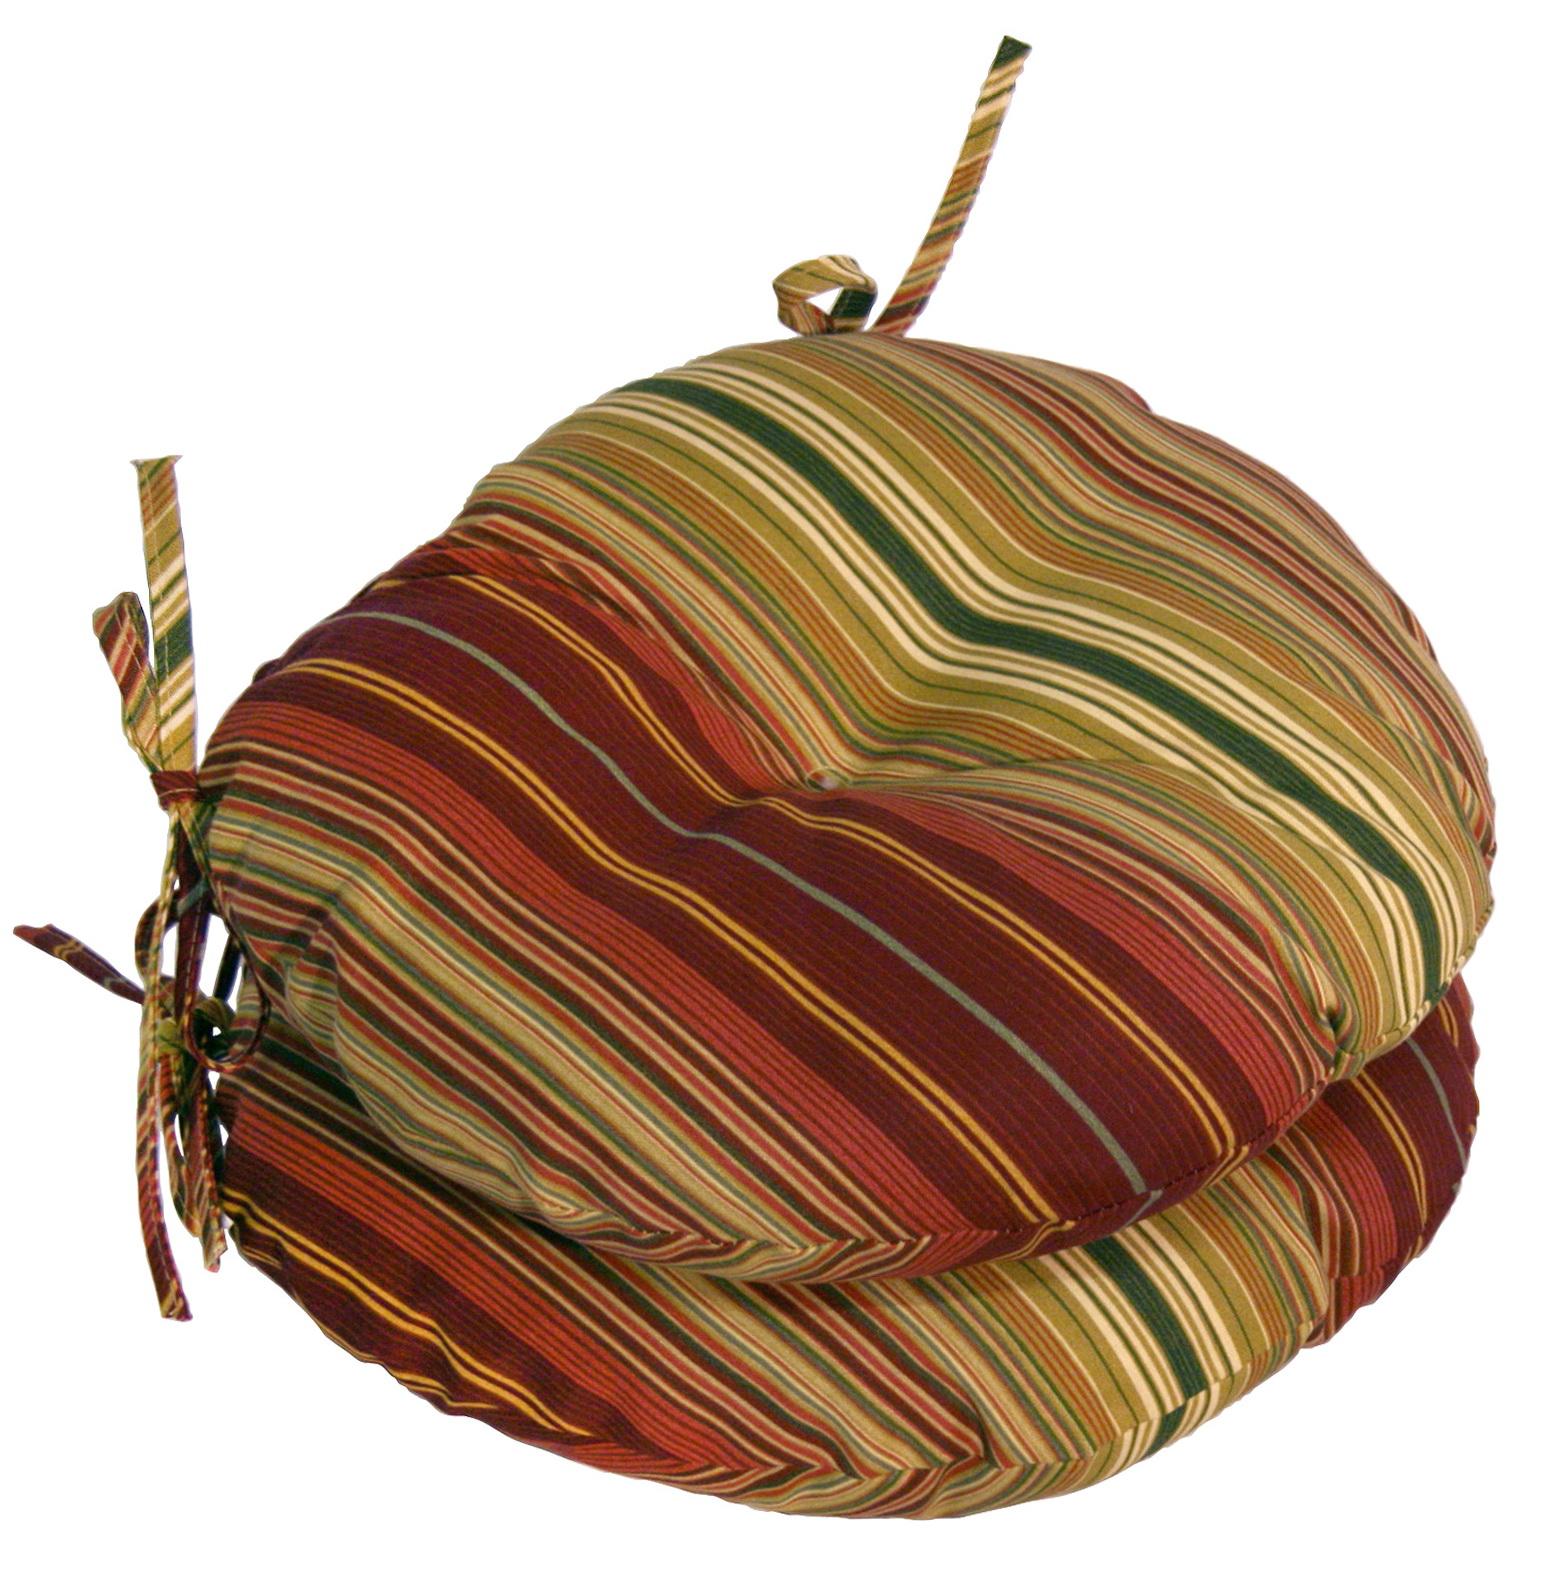 Round Outdoor Cushions Uk Home Design Ideas : round outdoor cushions uk from www.zintaaistars.com size 1568 x 1571 jpeg 635kB